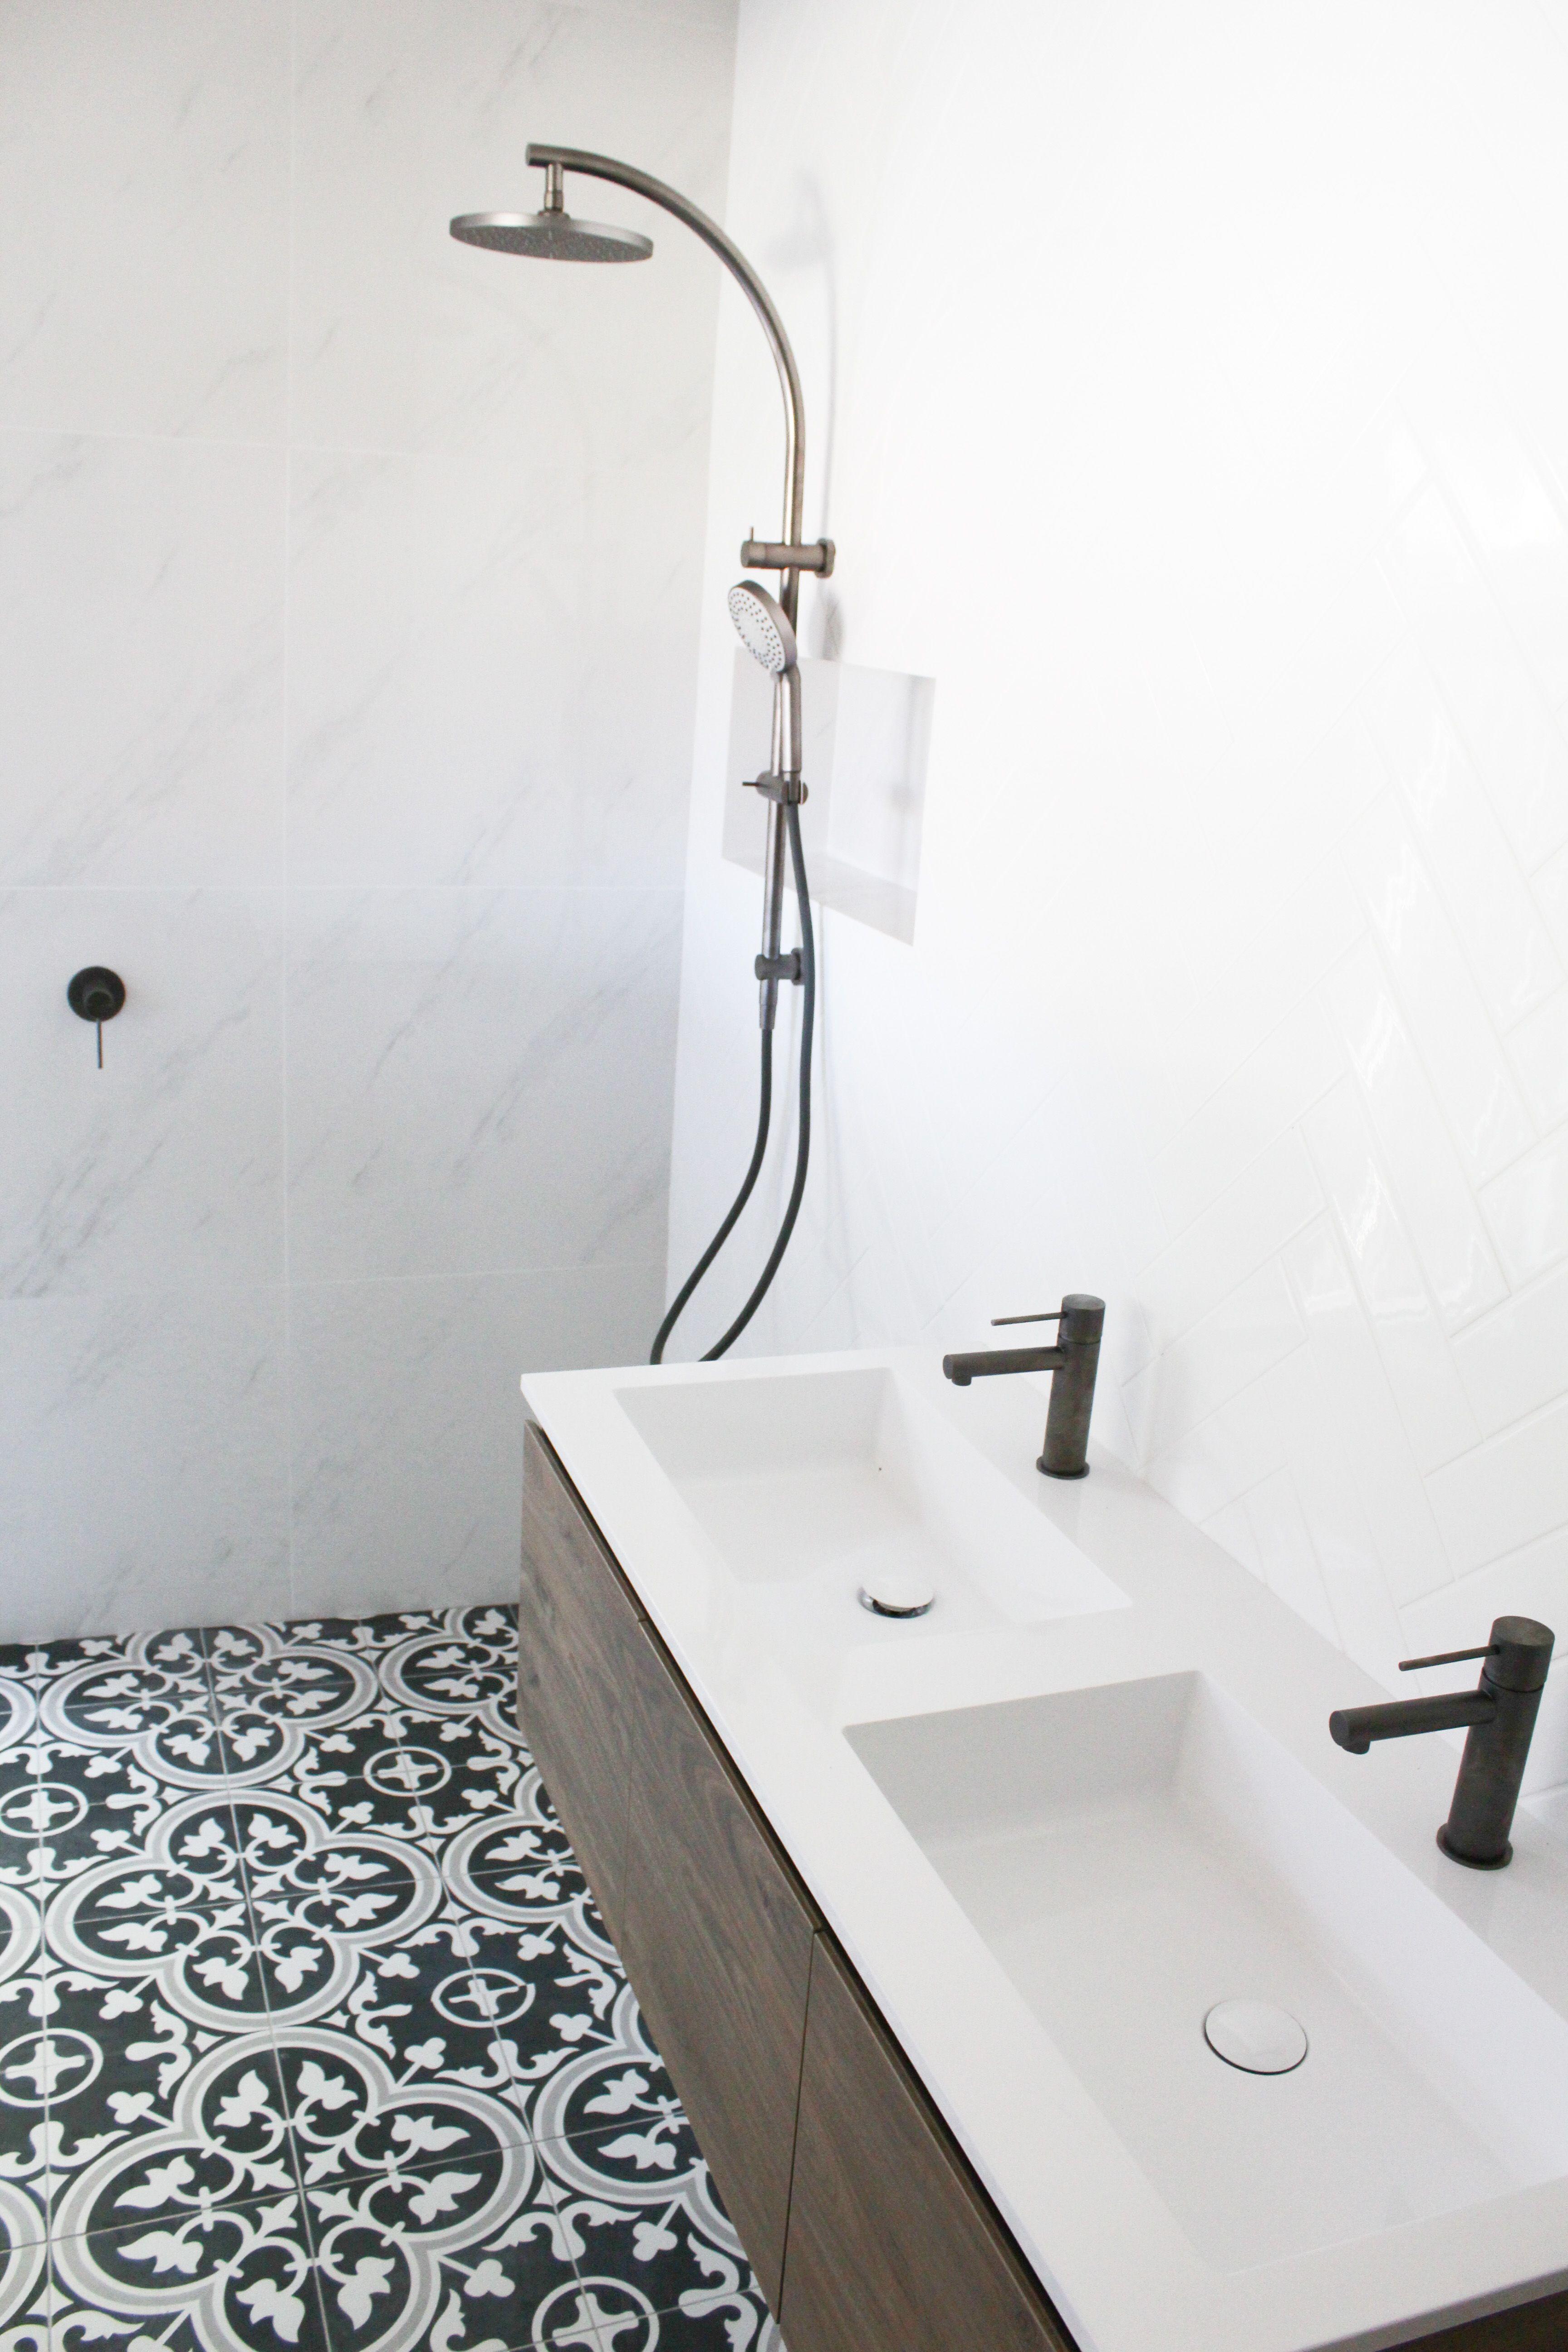 Encaustic Black And White Floor Marble Feature Wall Herringbone Tiles Wall Hung Dark Wood Vanity Wood Vanity Herringbone Wood Bathroom Renovations Perth